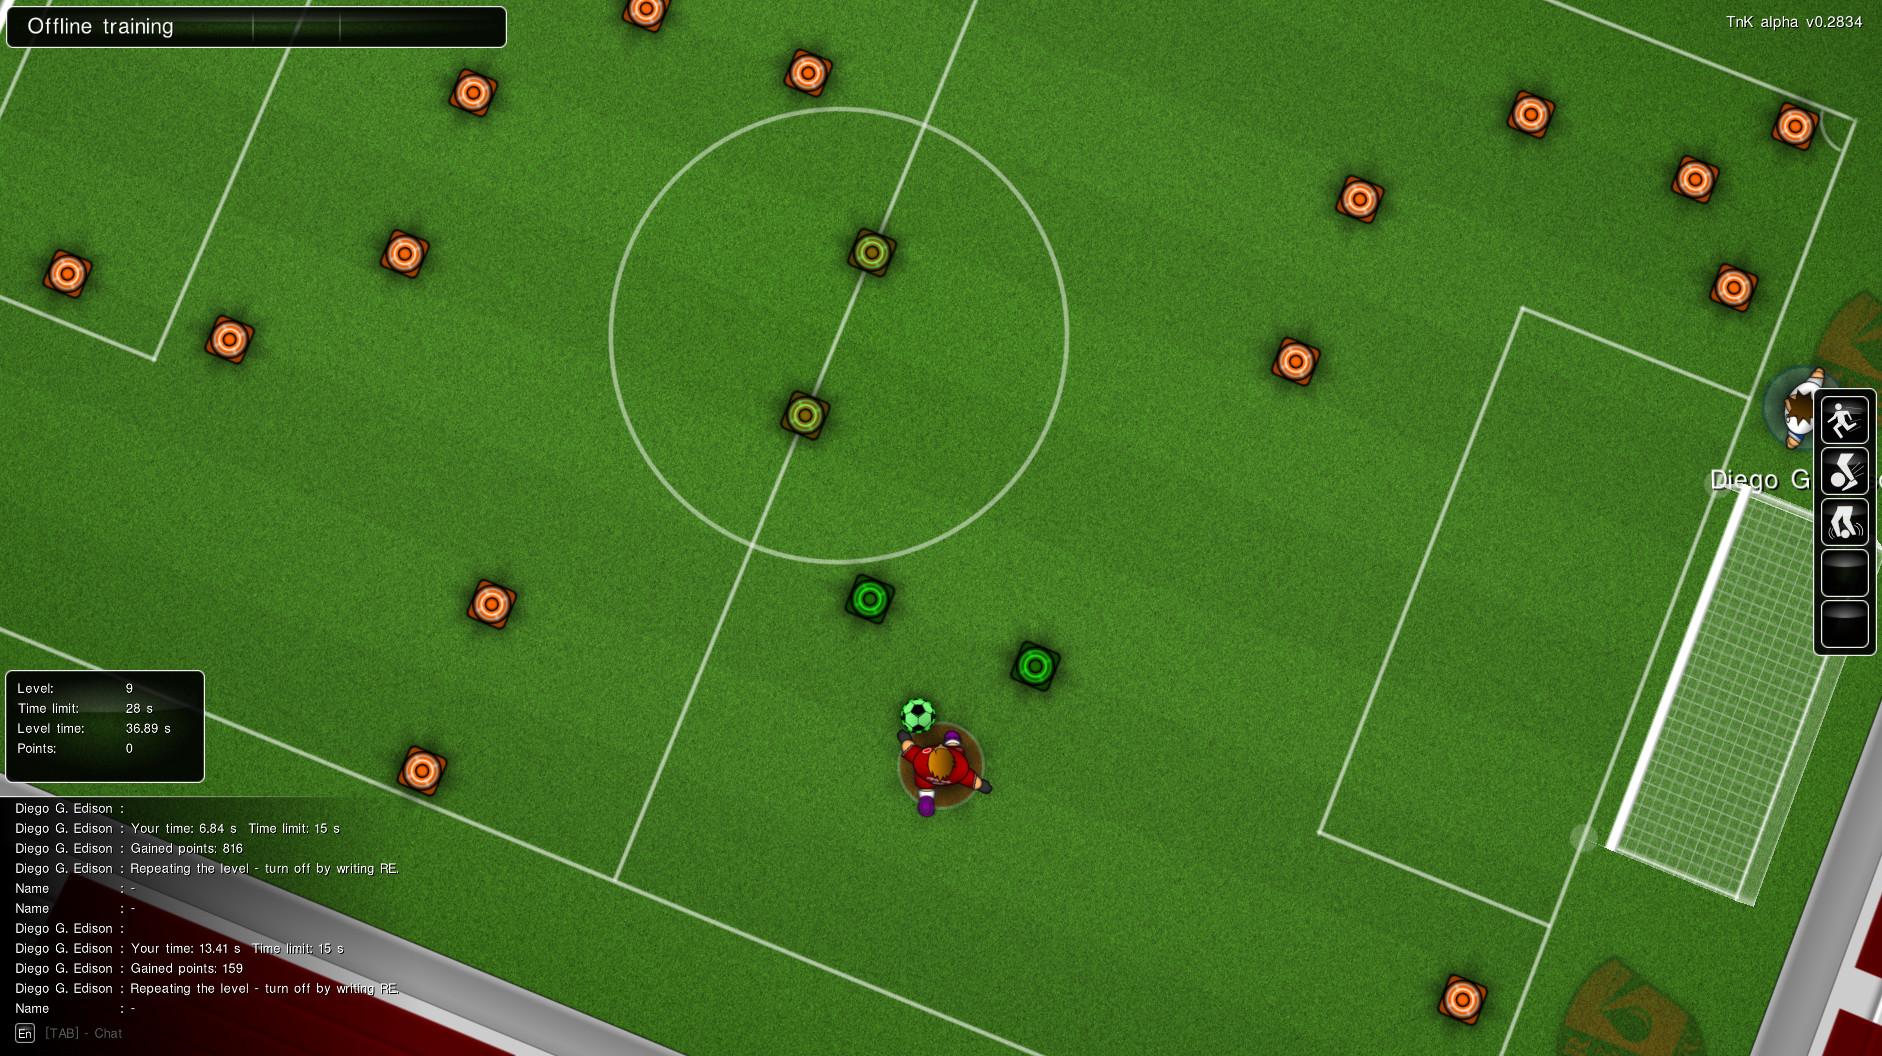 Training - ball control